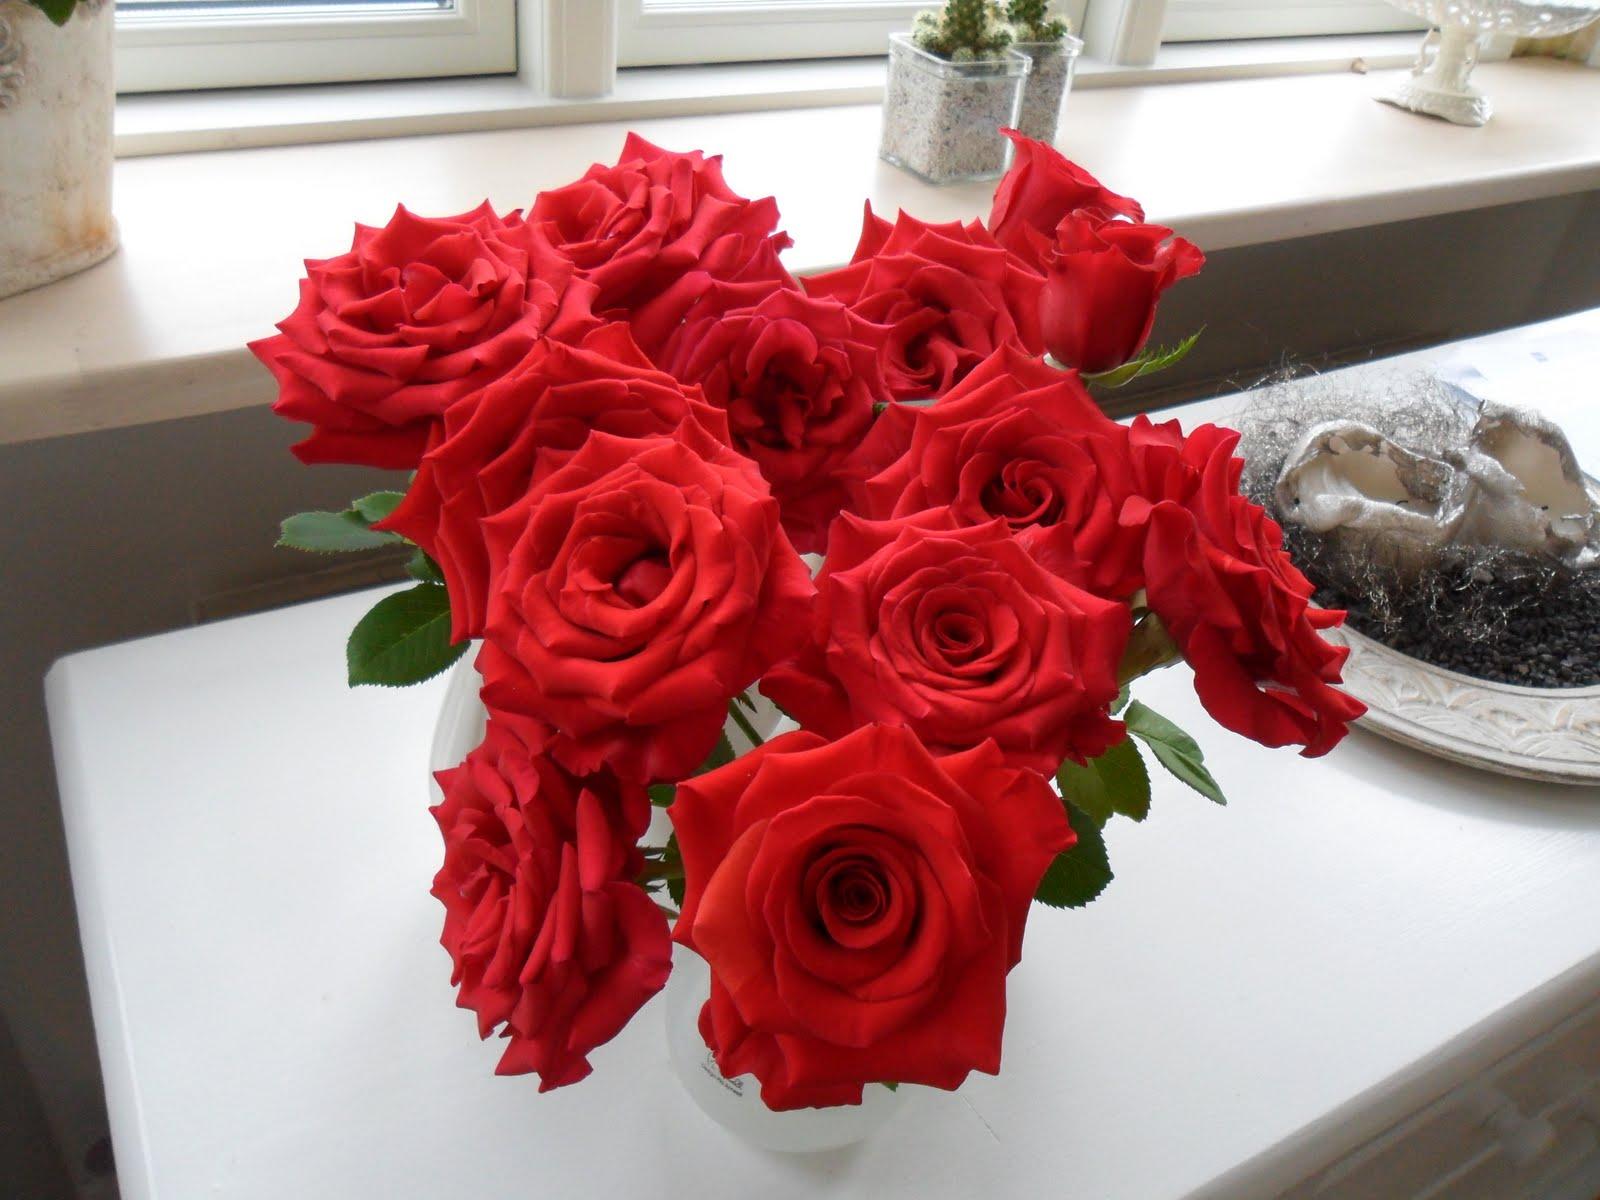 Kort & Godt med Louise Hou: Årets første buket roser fra haven